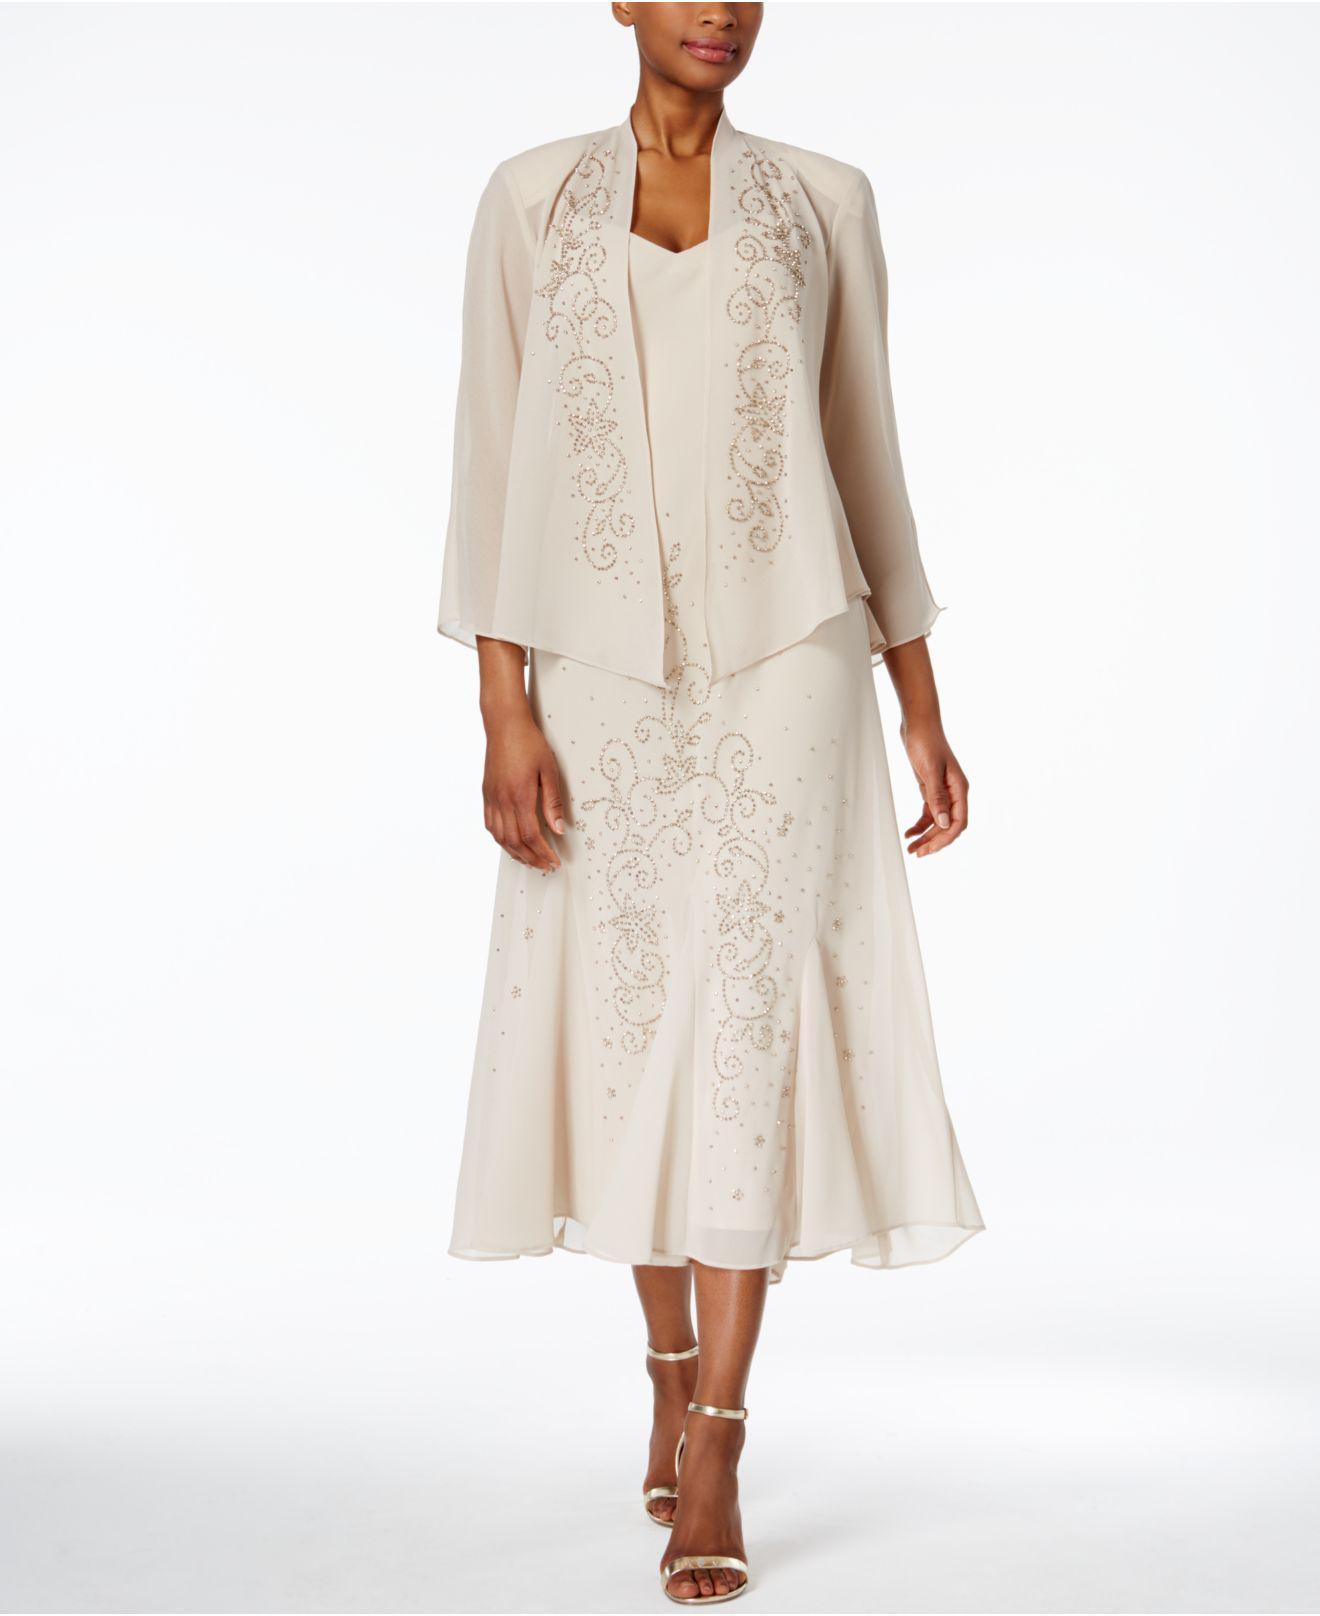 07939eb768575 R   M Richards. Women s Natural R m Richards Sleeveless Beaded V-neck Dress  And Jacket